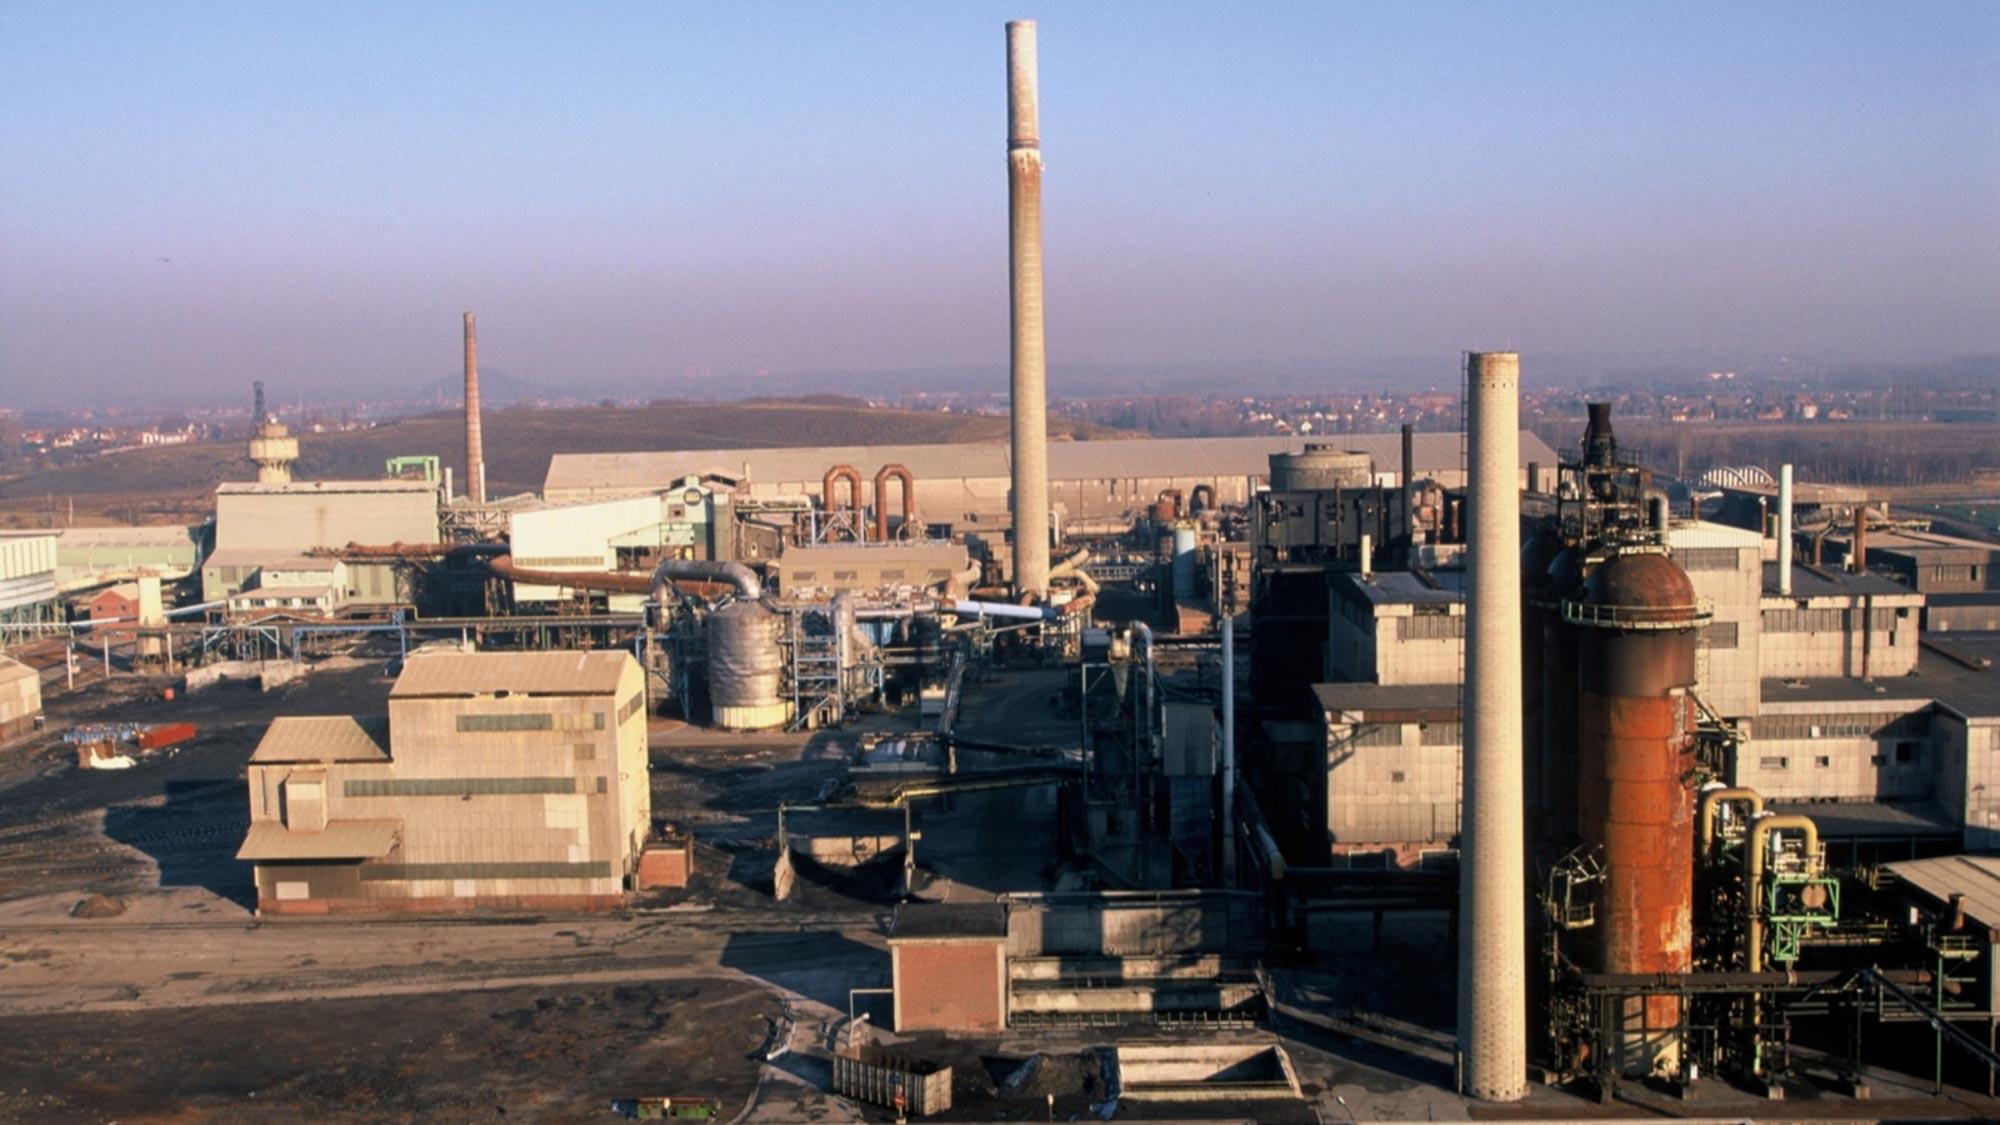 Metaleurop nord工厂在法国